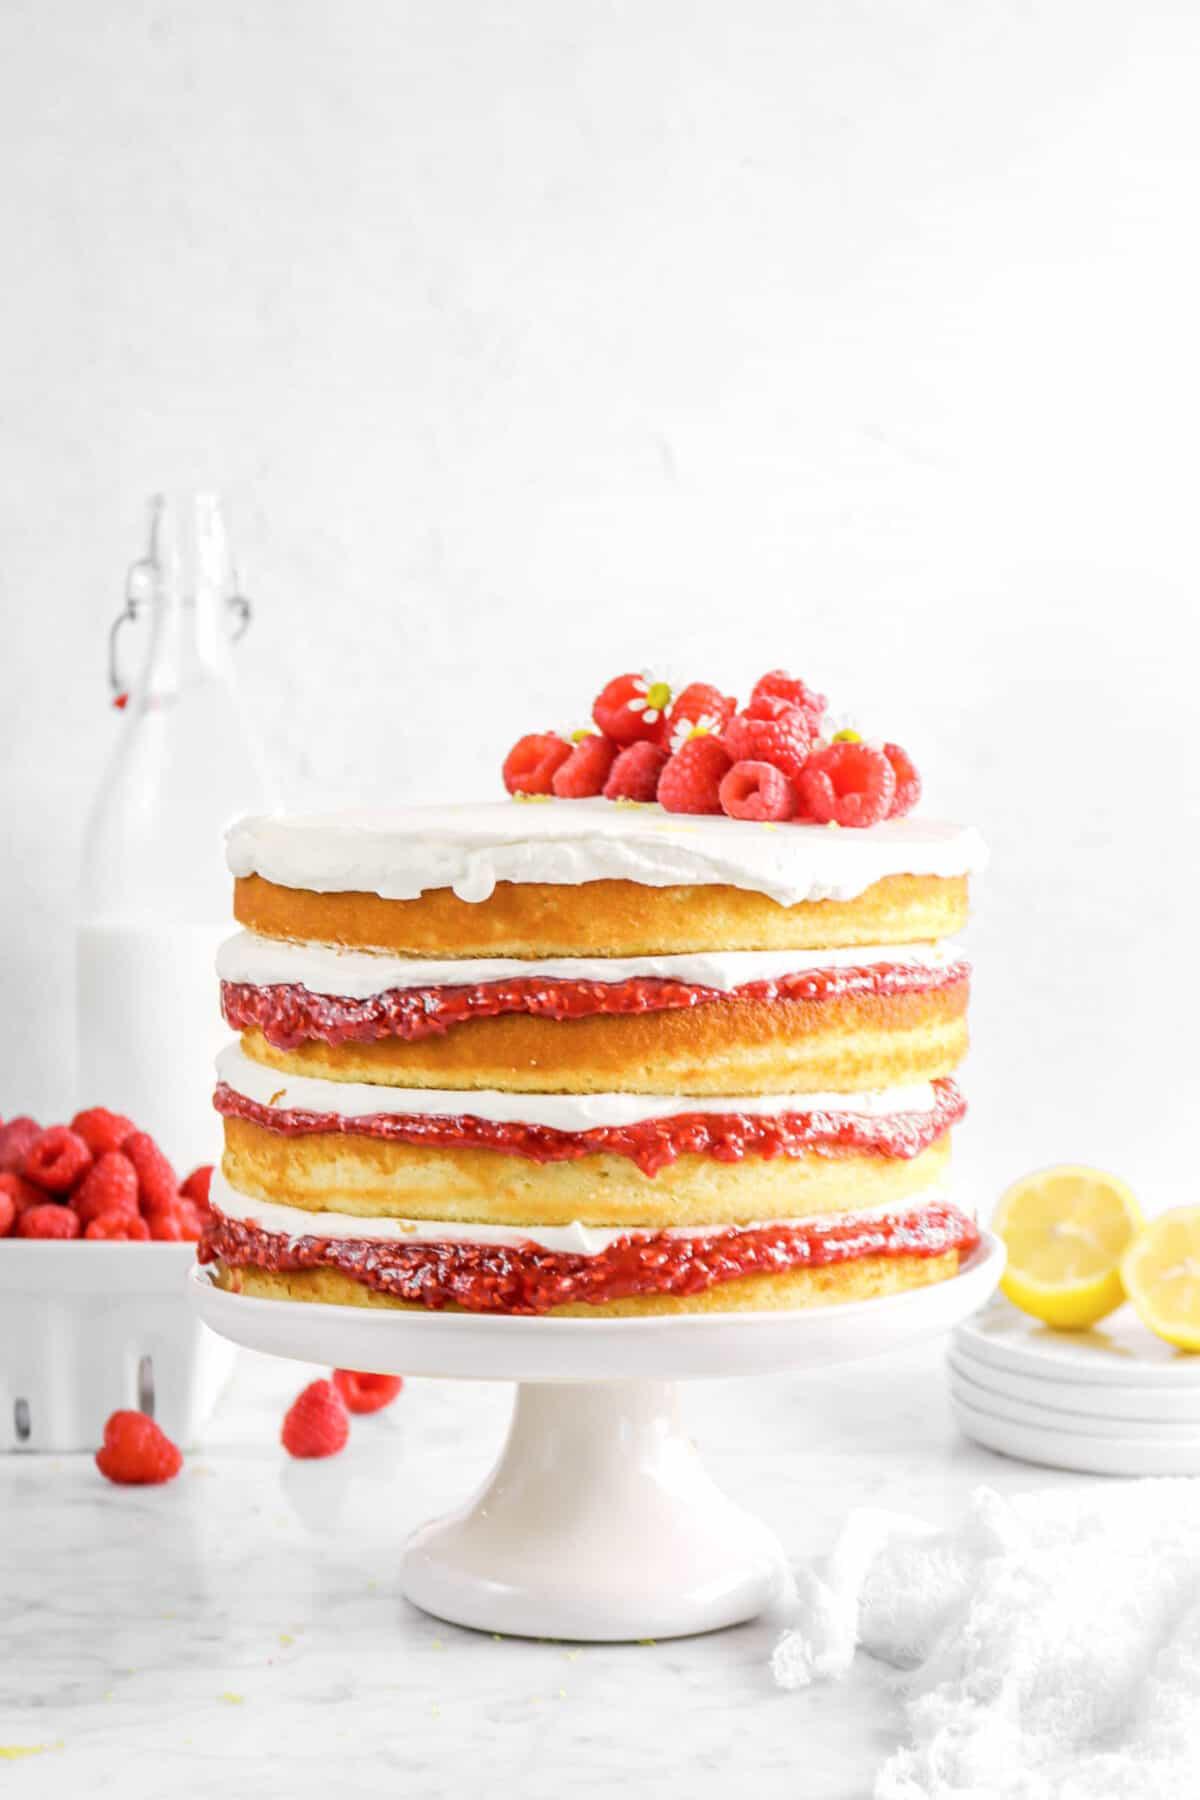 lemon raspberry cake on cake plate with lemons, raspberries, a cheese cloth, and milk